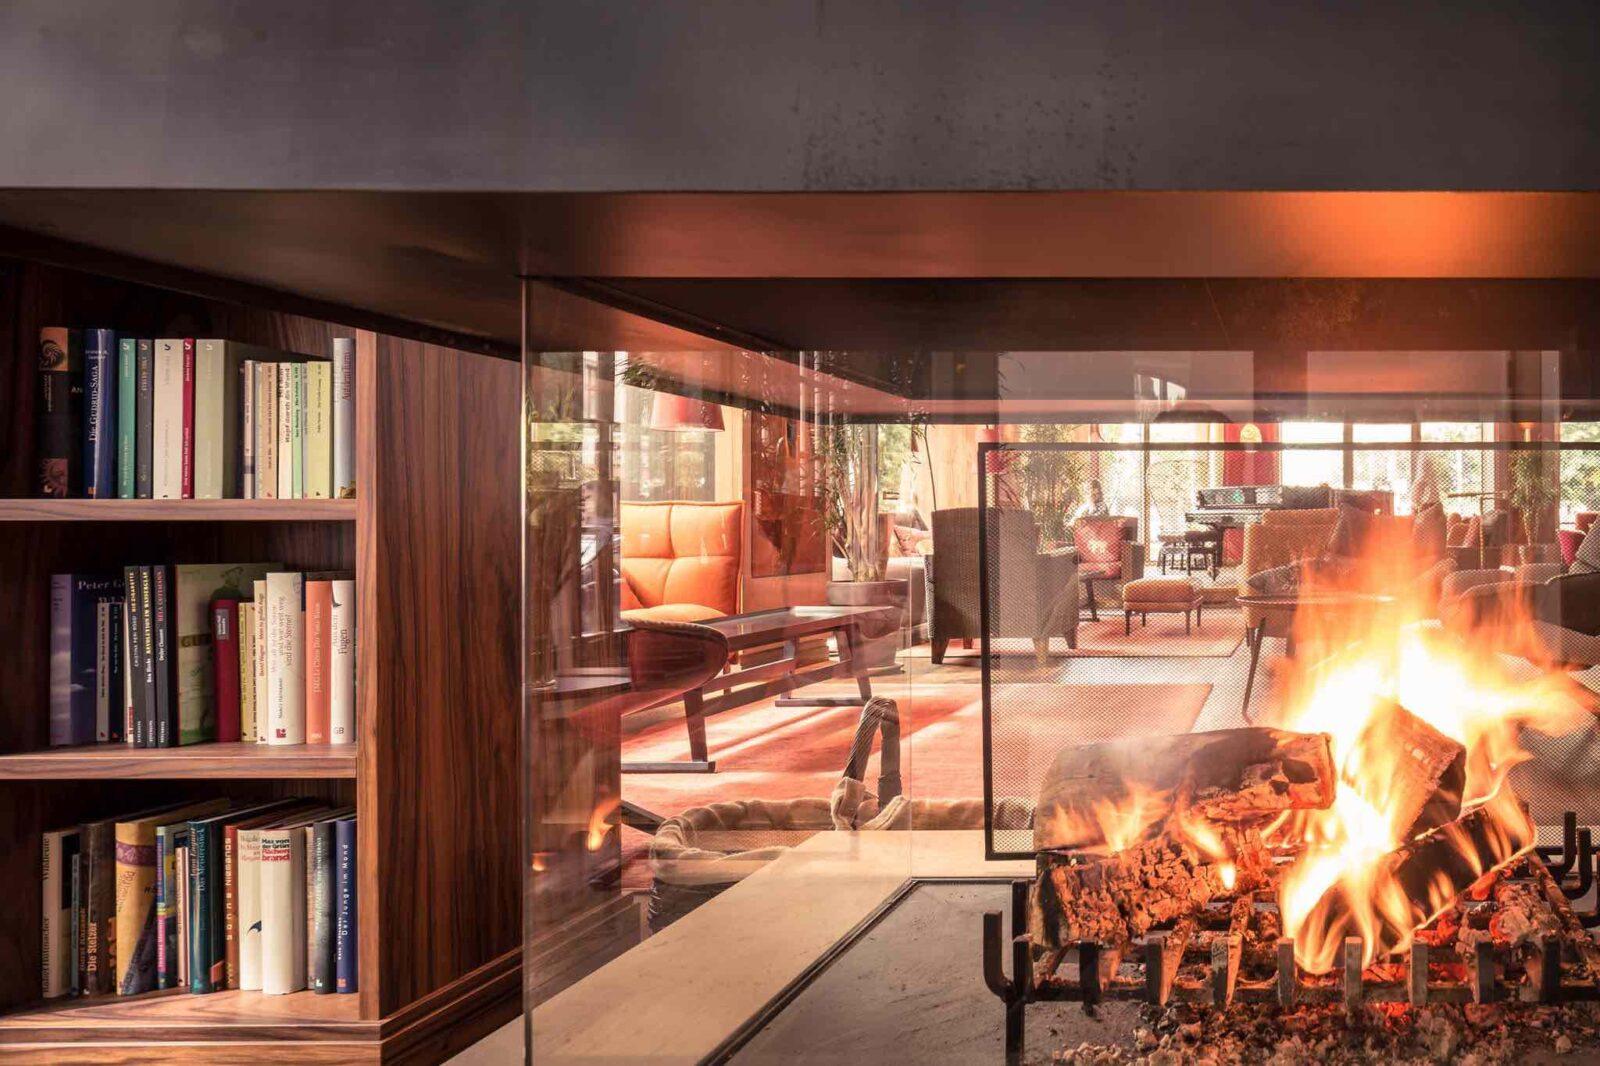 Hotel Orania Berlin - lounge area with fireplace of berlin hotel bars